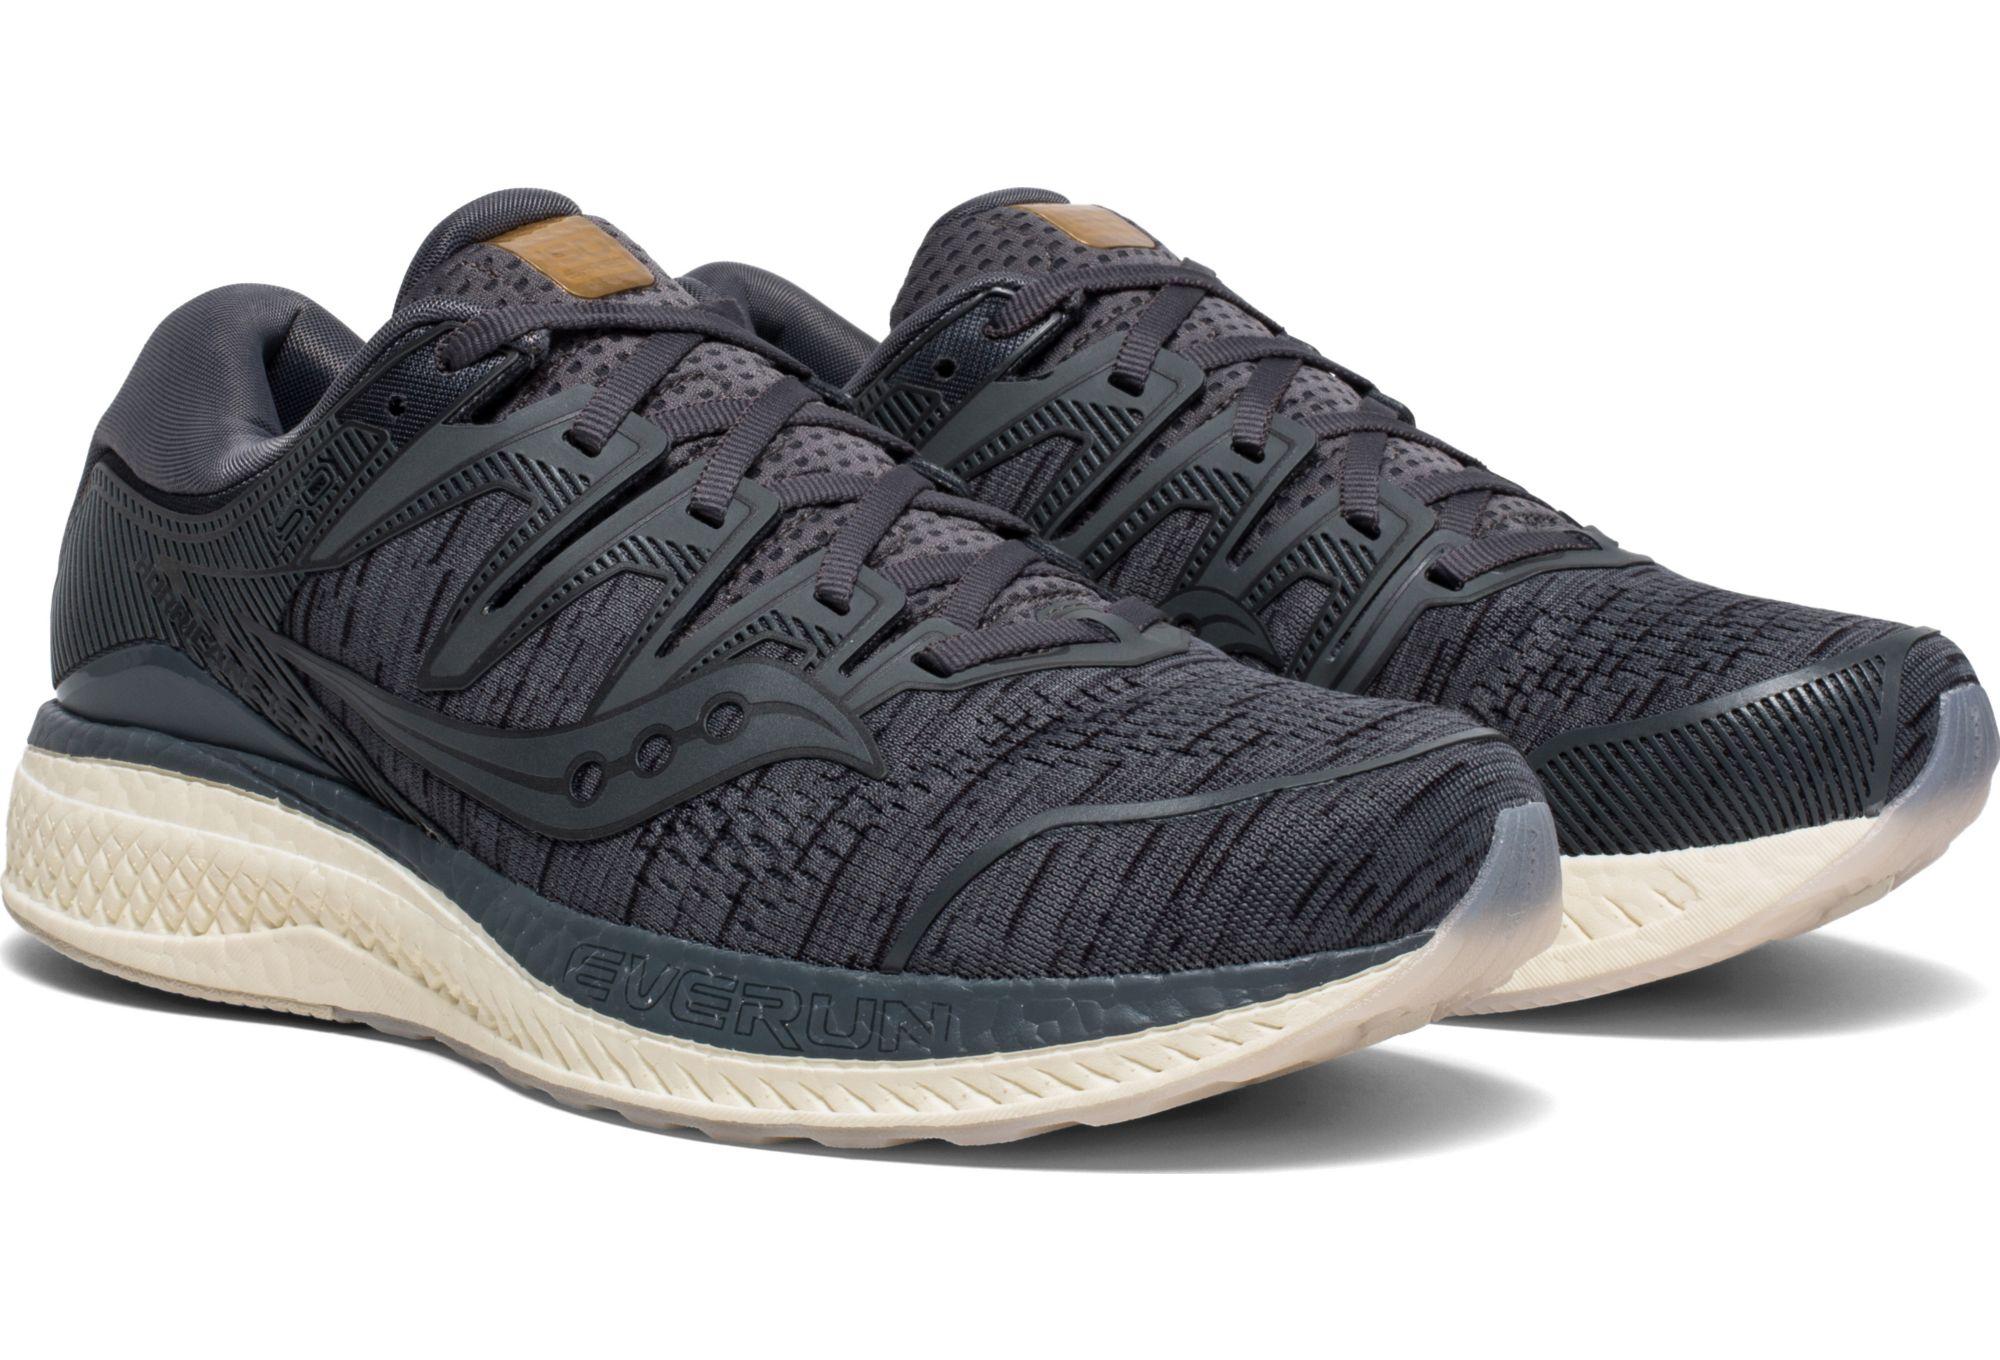 Saucony Hurricane ISO 5 Running Shoes